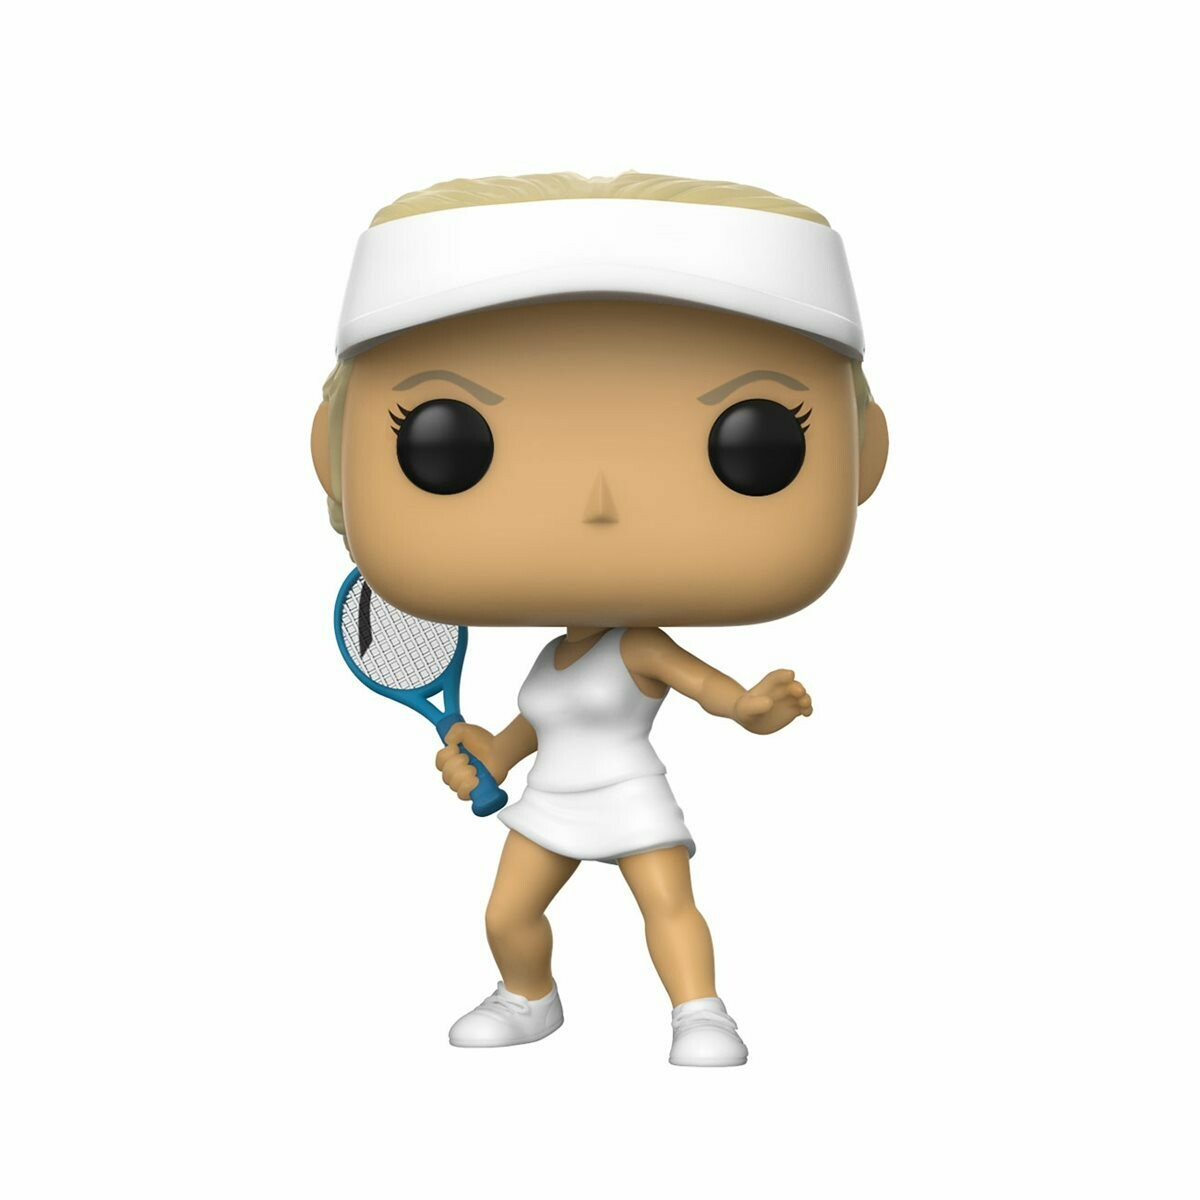 PRE-ORDER Tennis Legends Maria Sharapova Pop! Vinyl Figure